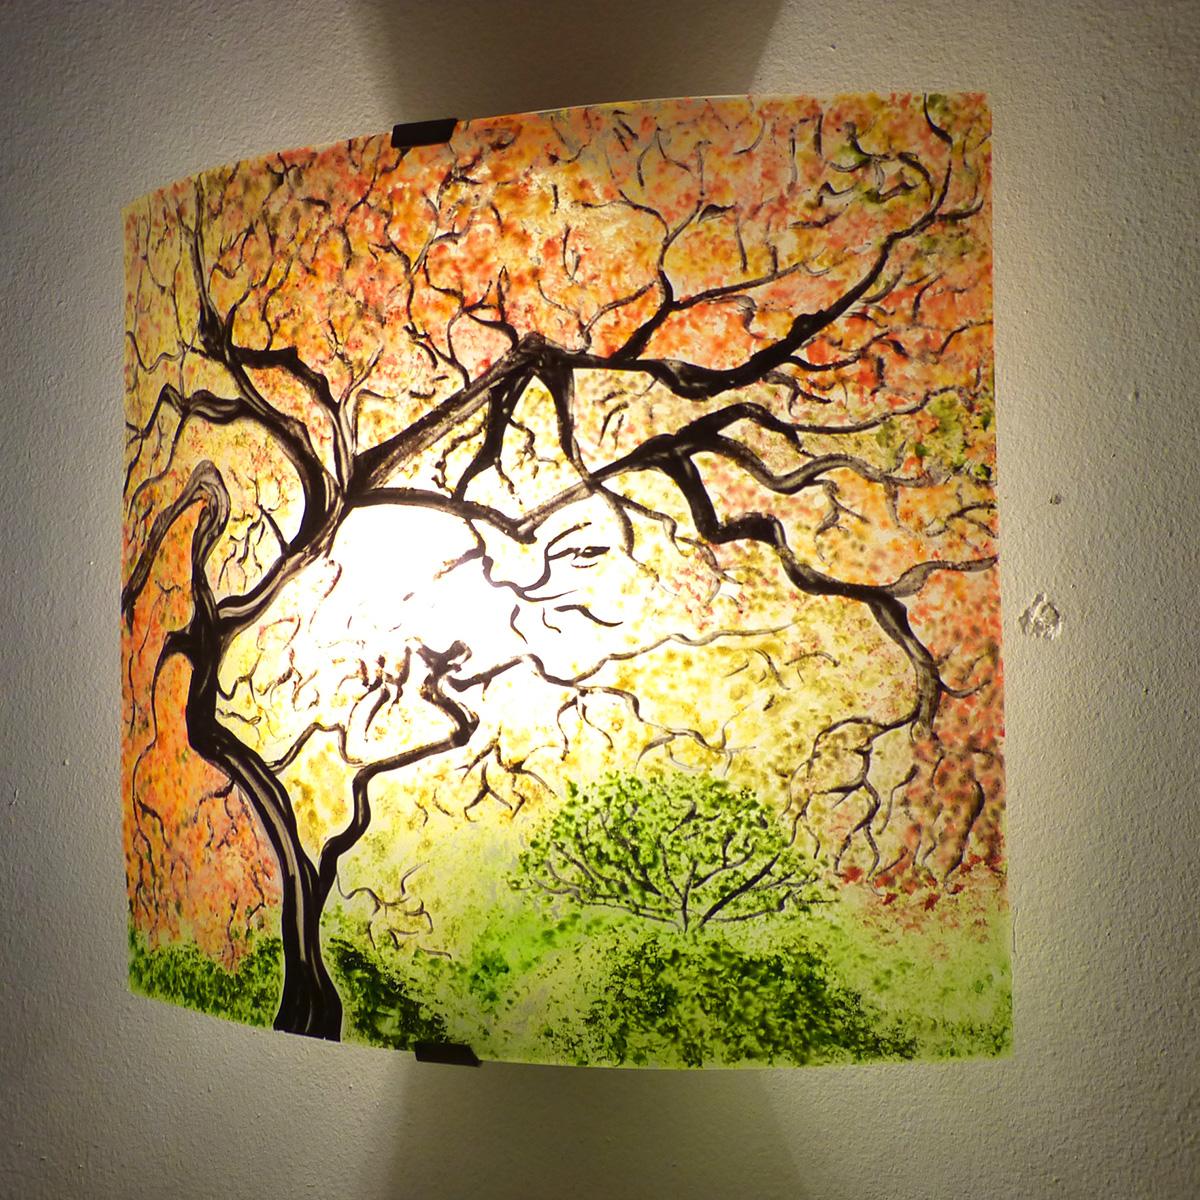 luminaire applique murale paysage arbre jaune orange et vert. Black Bedroom Furniture Sets. Home Design Ideas